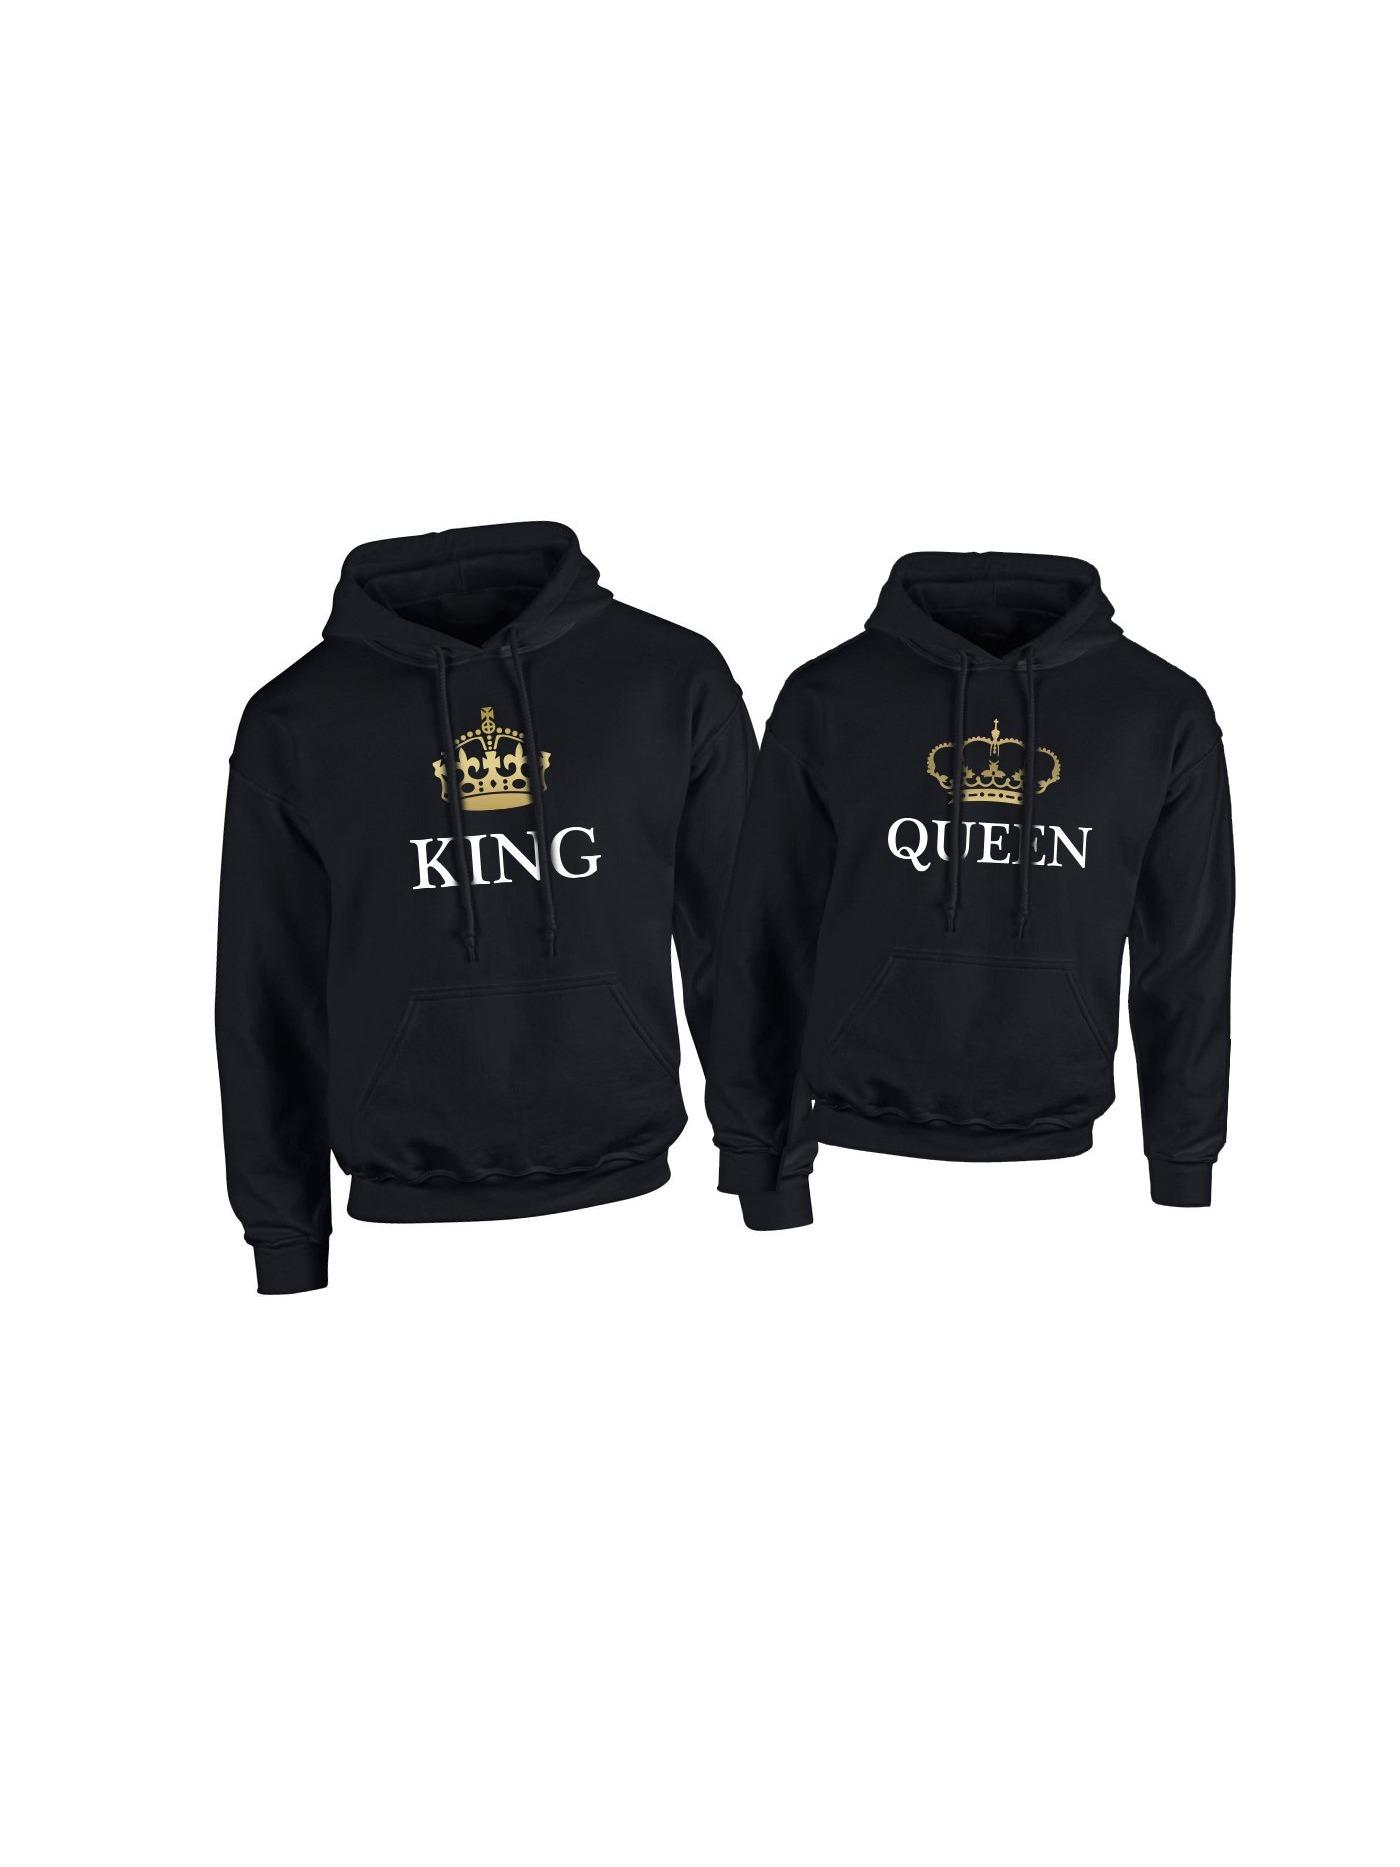 da96daa2b Mikiny pre pár King Queen